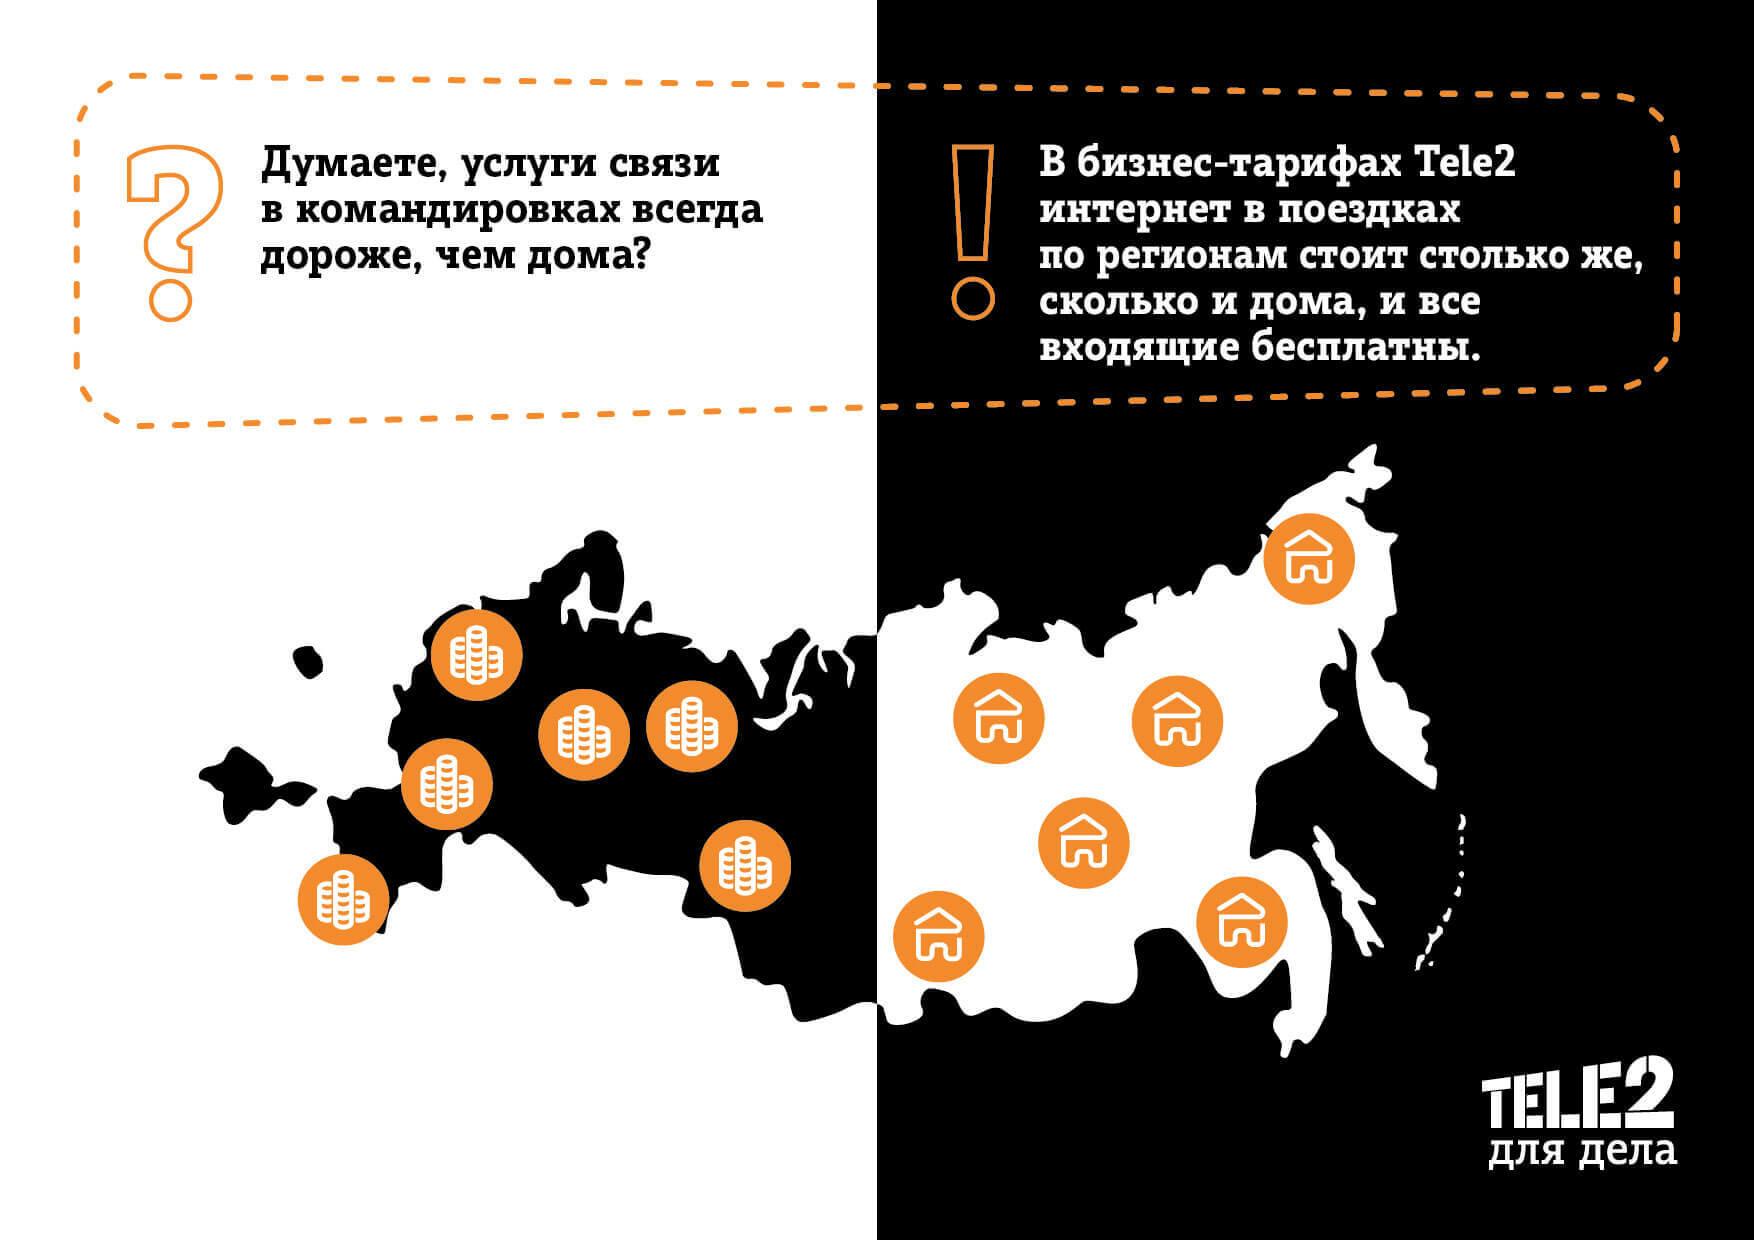 теле2 тарифный план сигма